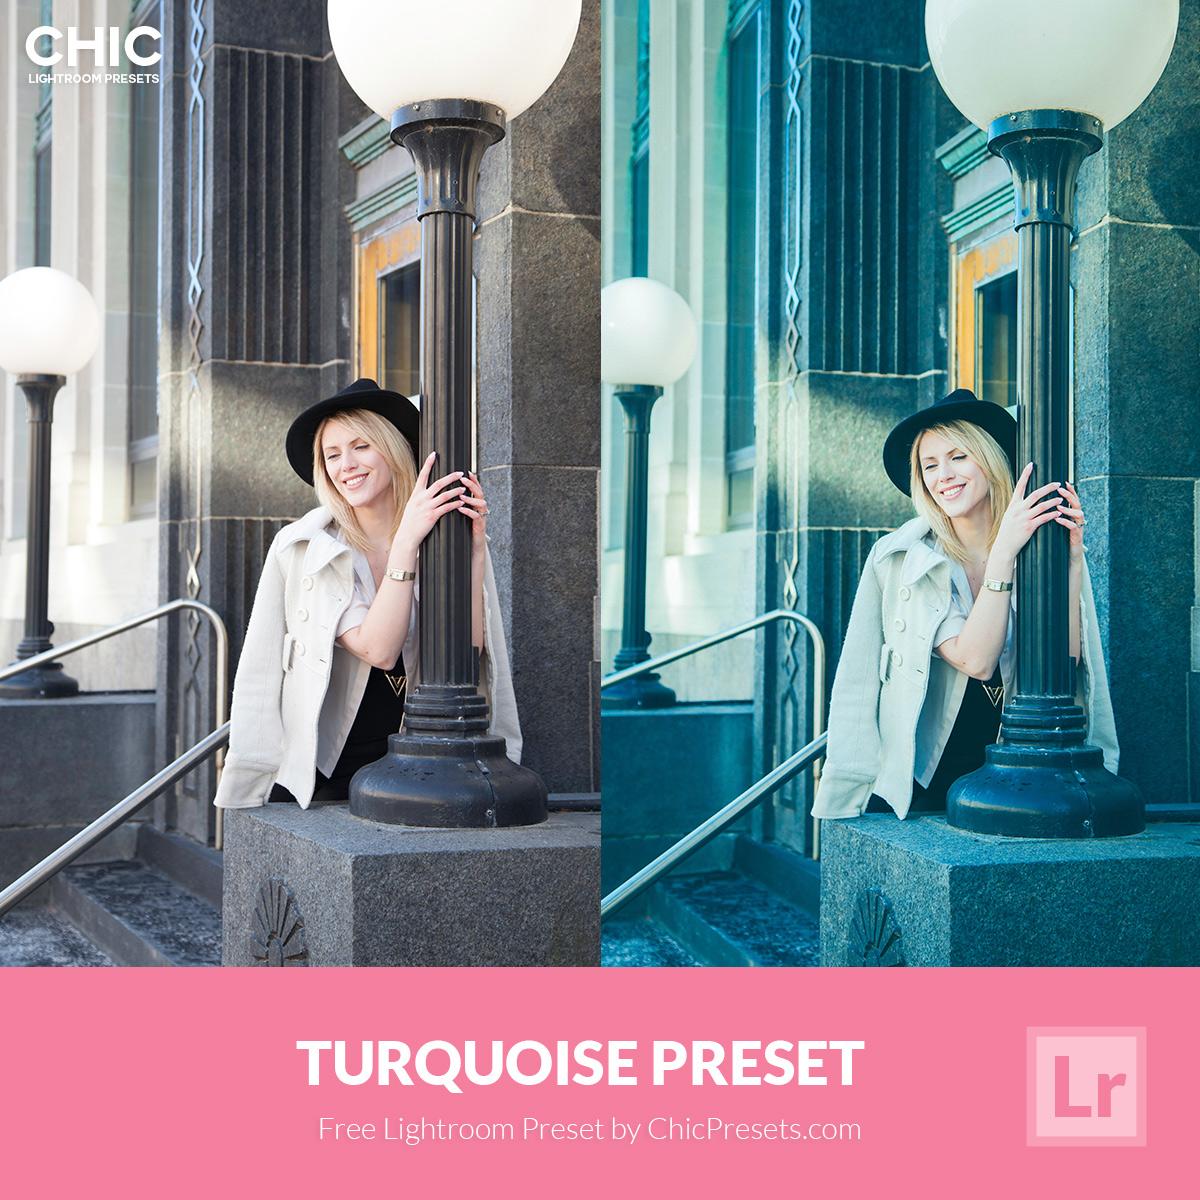 Free-Lightroom-Preset-Turquoise-chic